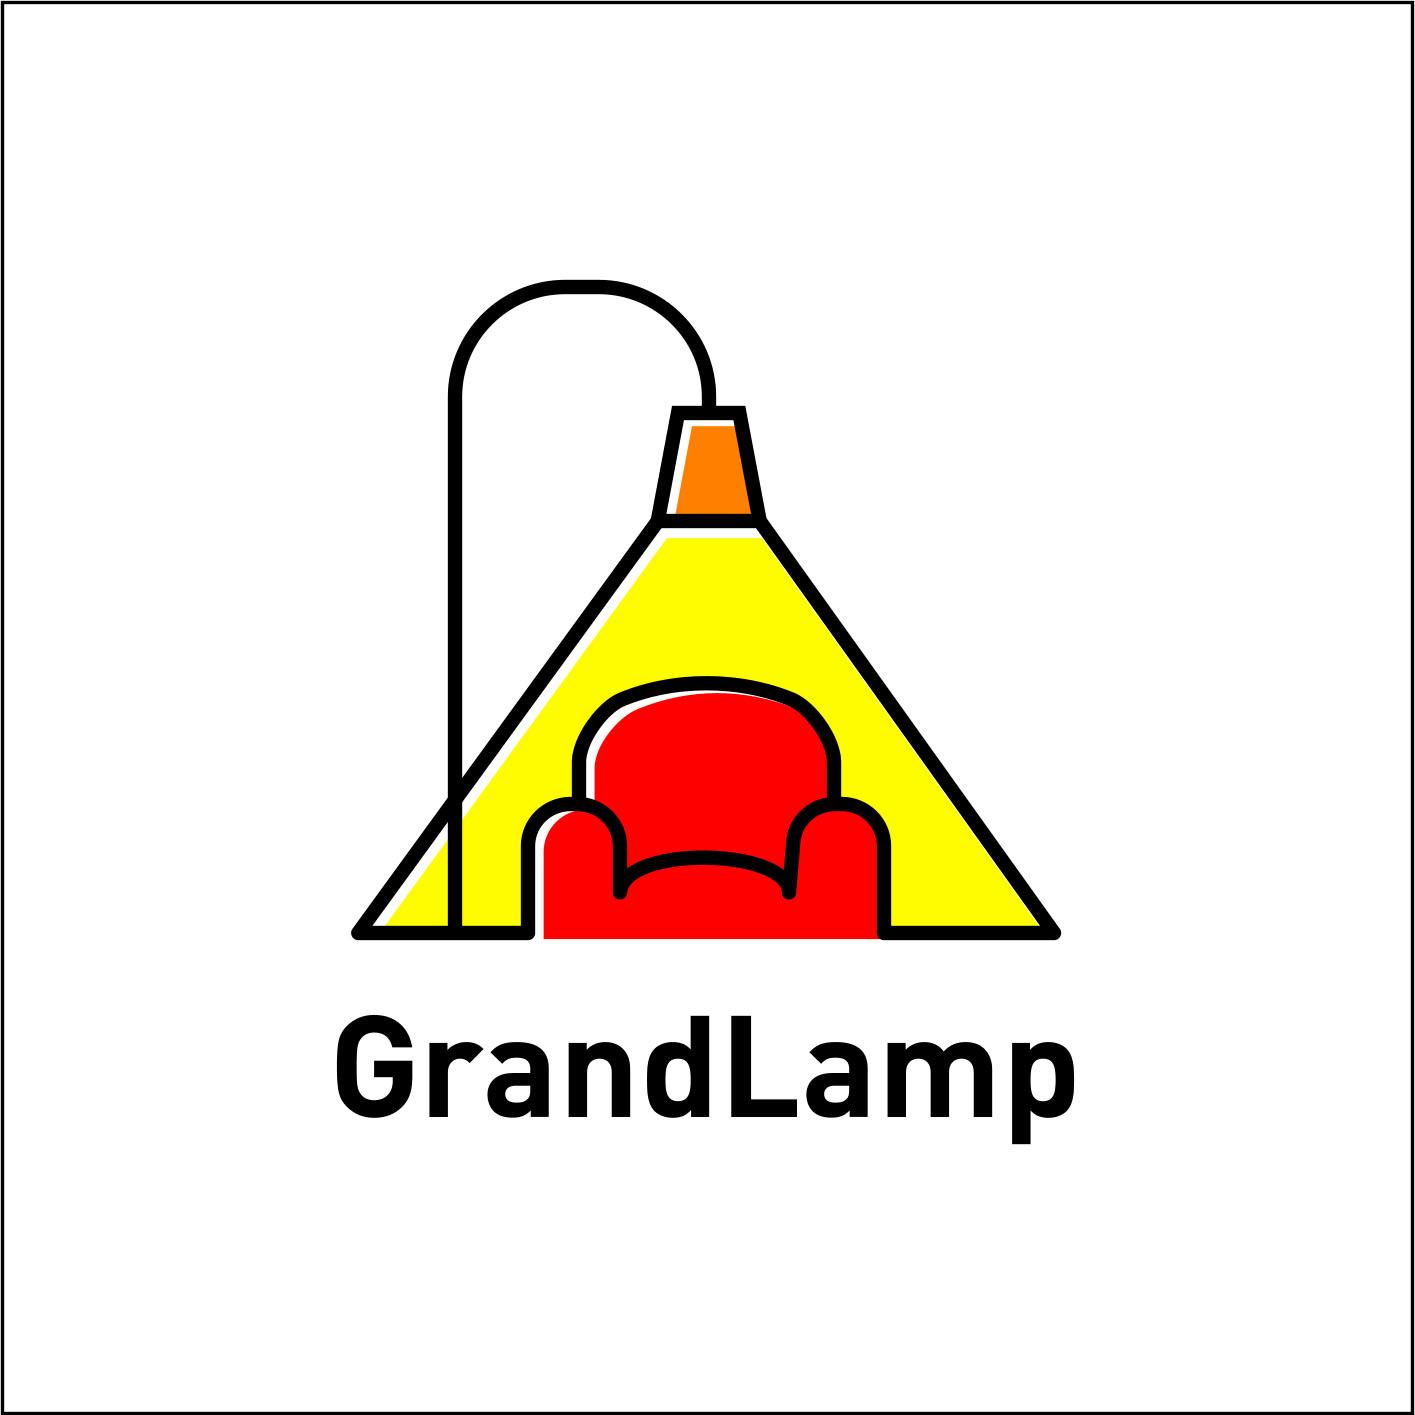 Разработка логотипа и элементов фирменного стиля фото f_07257df073f106d1.jpg